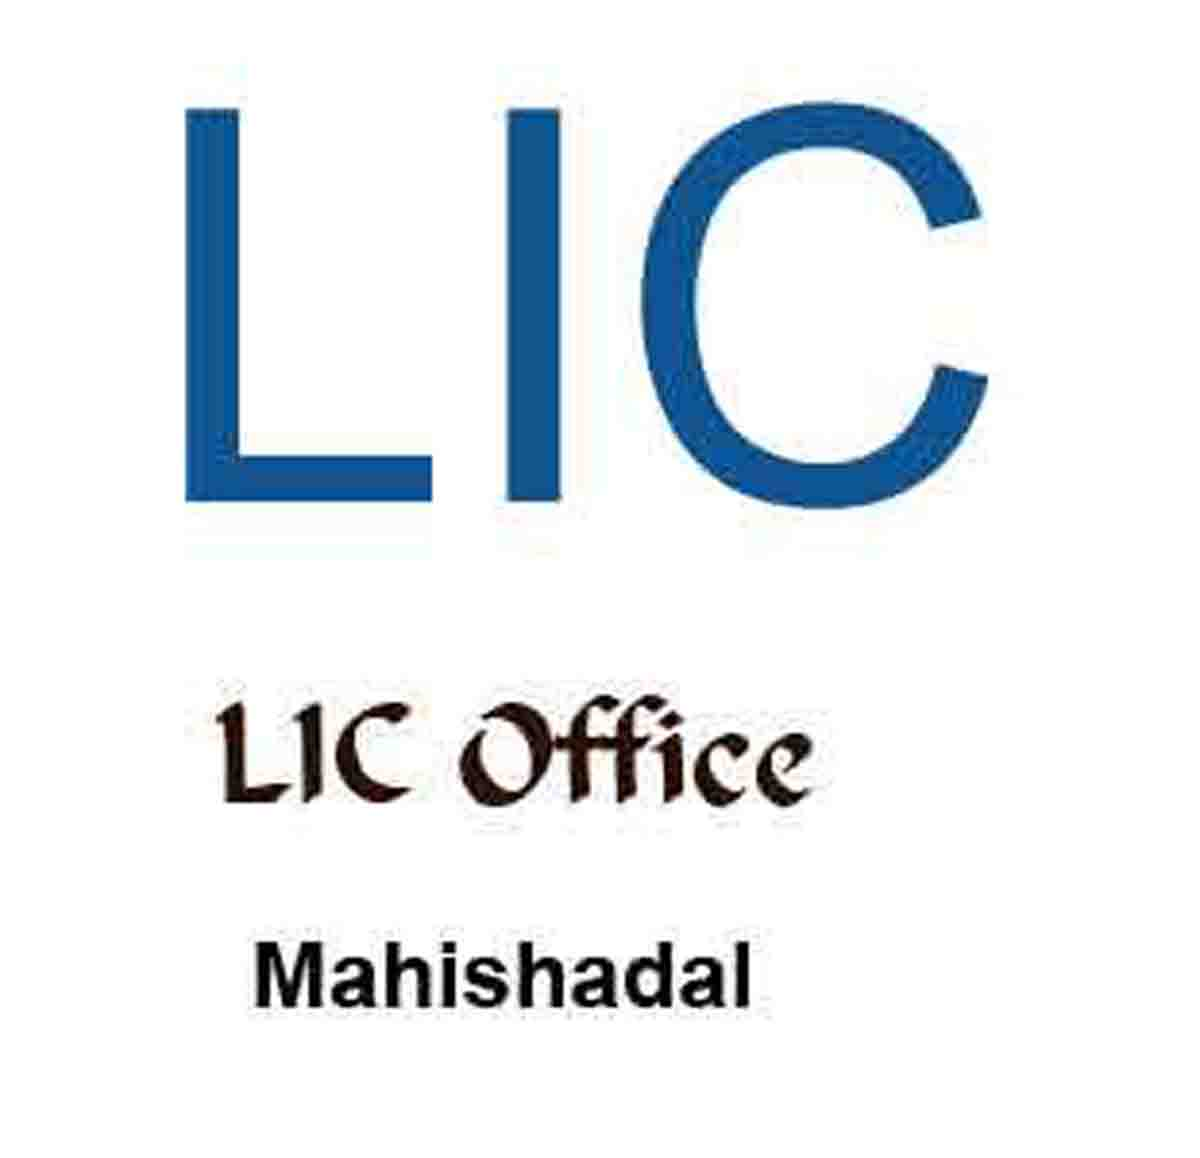 lic office mahishadal